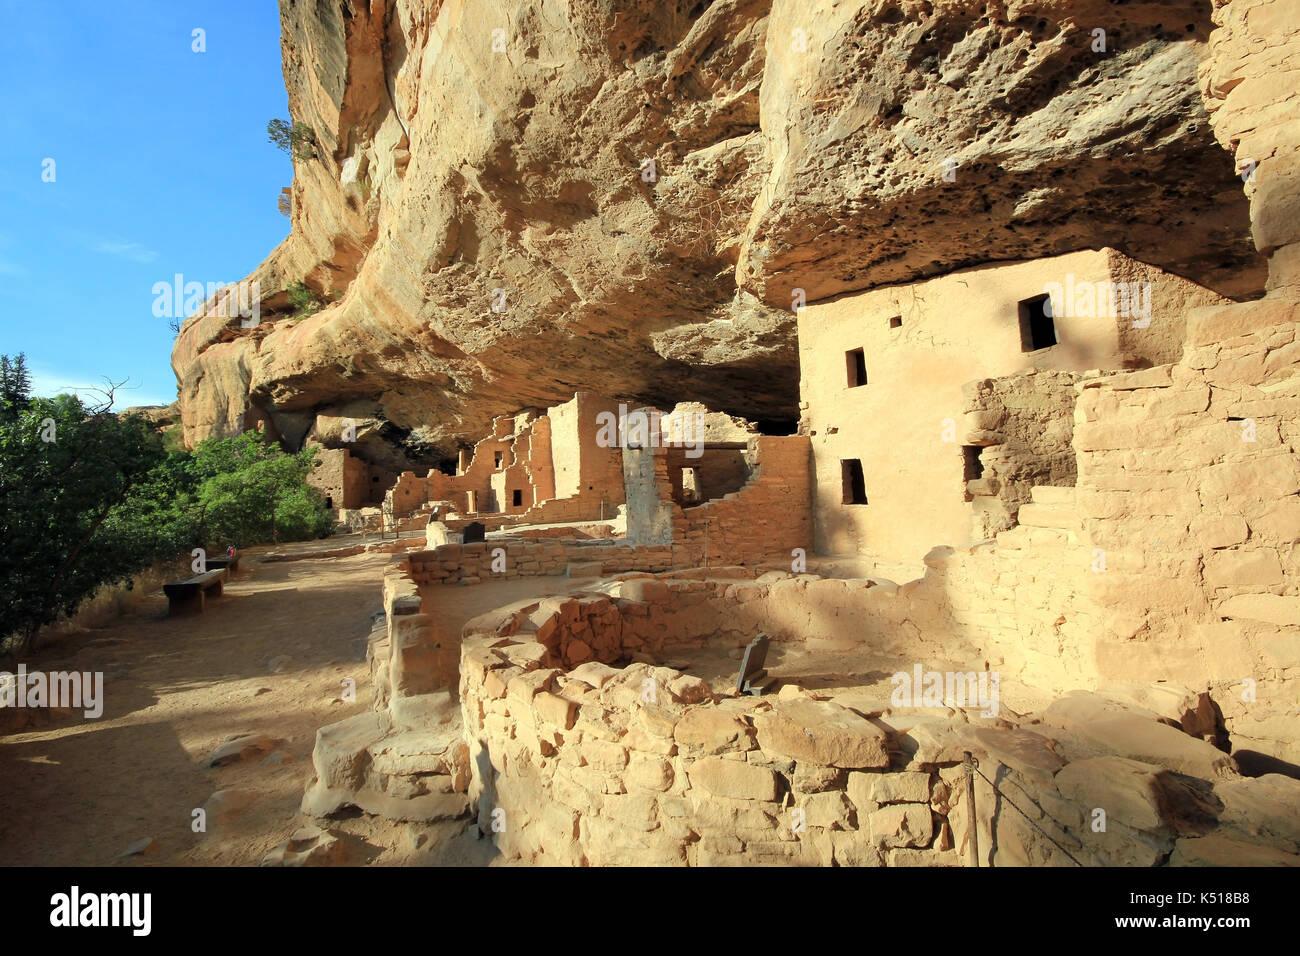 Mesa Verde Cliff Dwellings - Stock Image